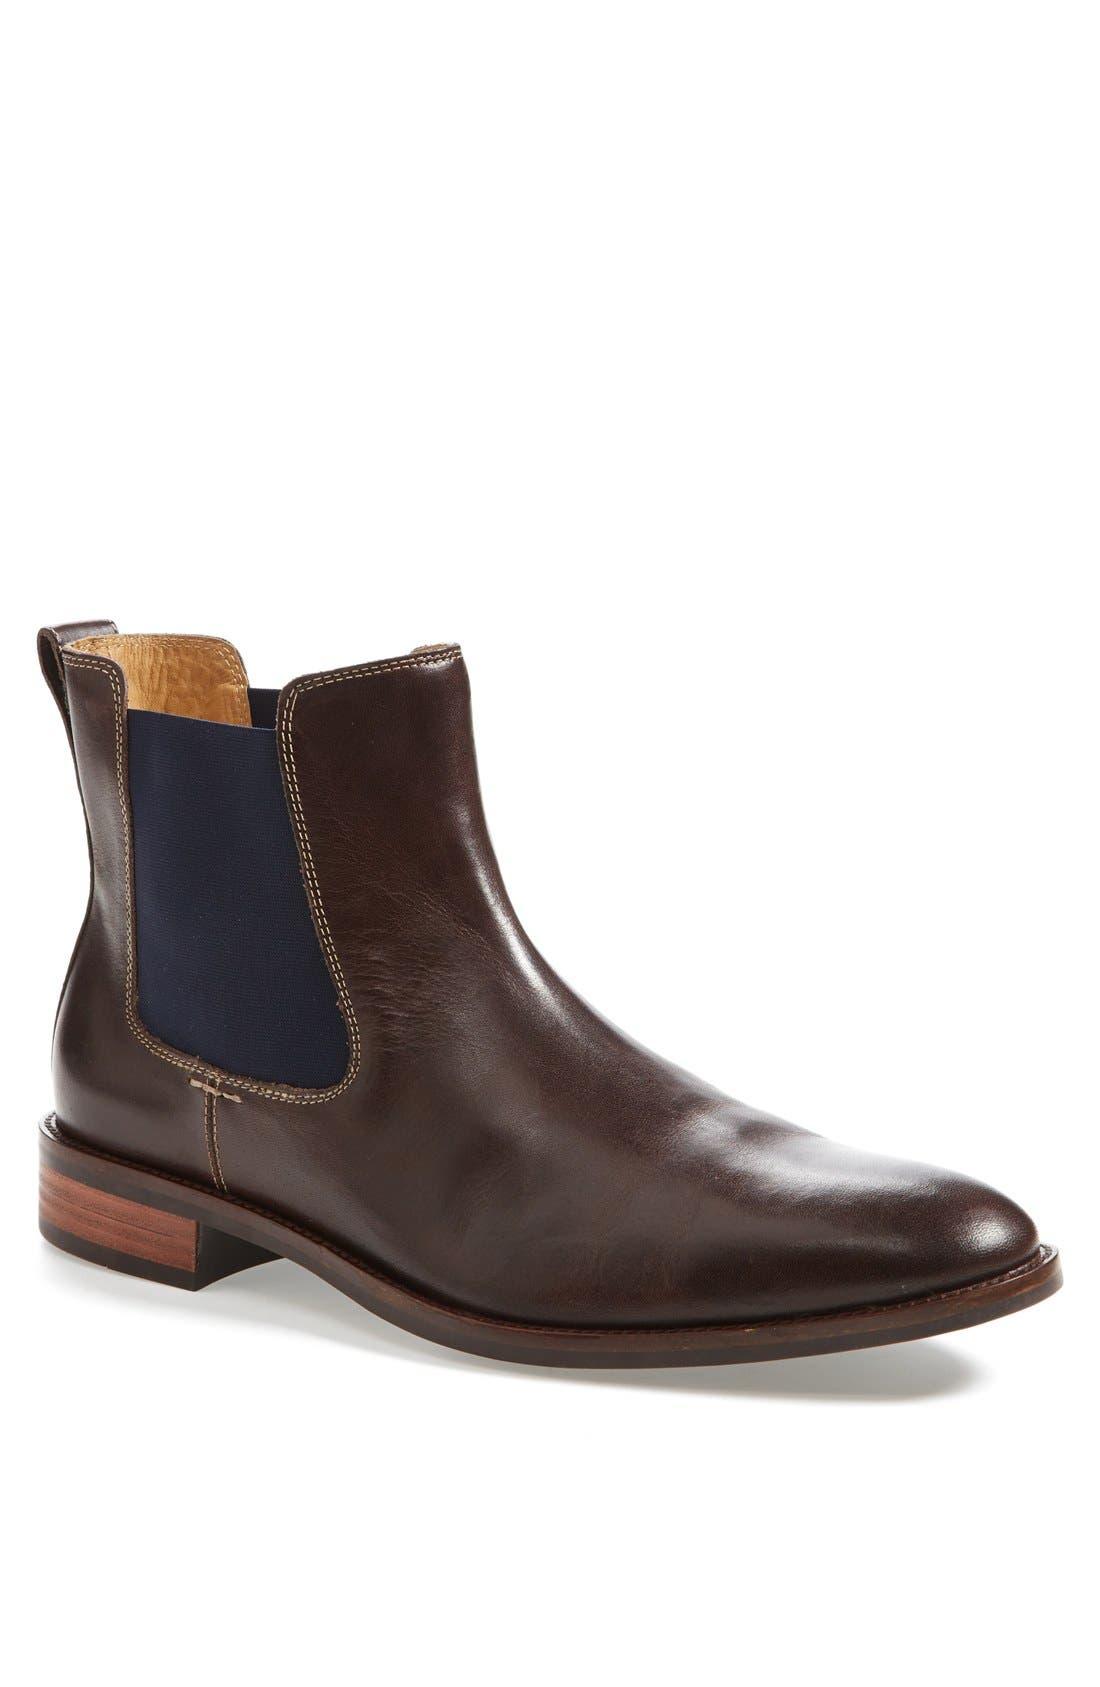 Main Image - Cole Haan 'Lenox Hill' Chelsea Boot (Men)